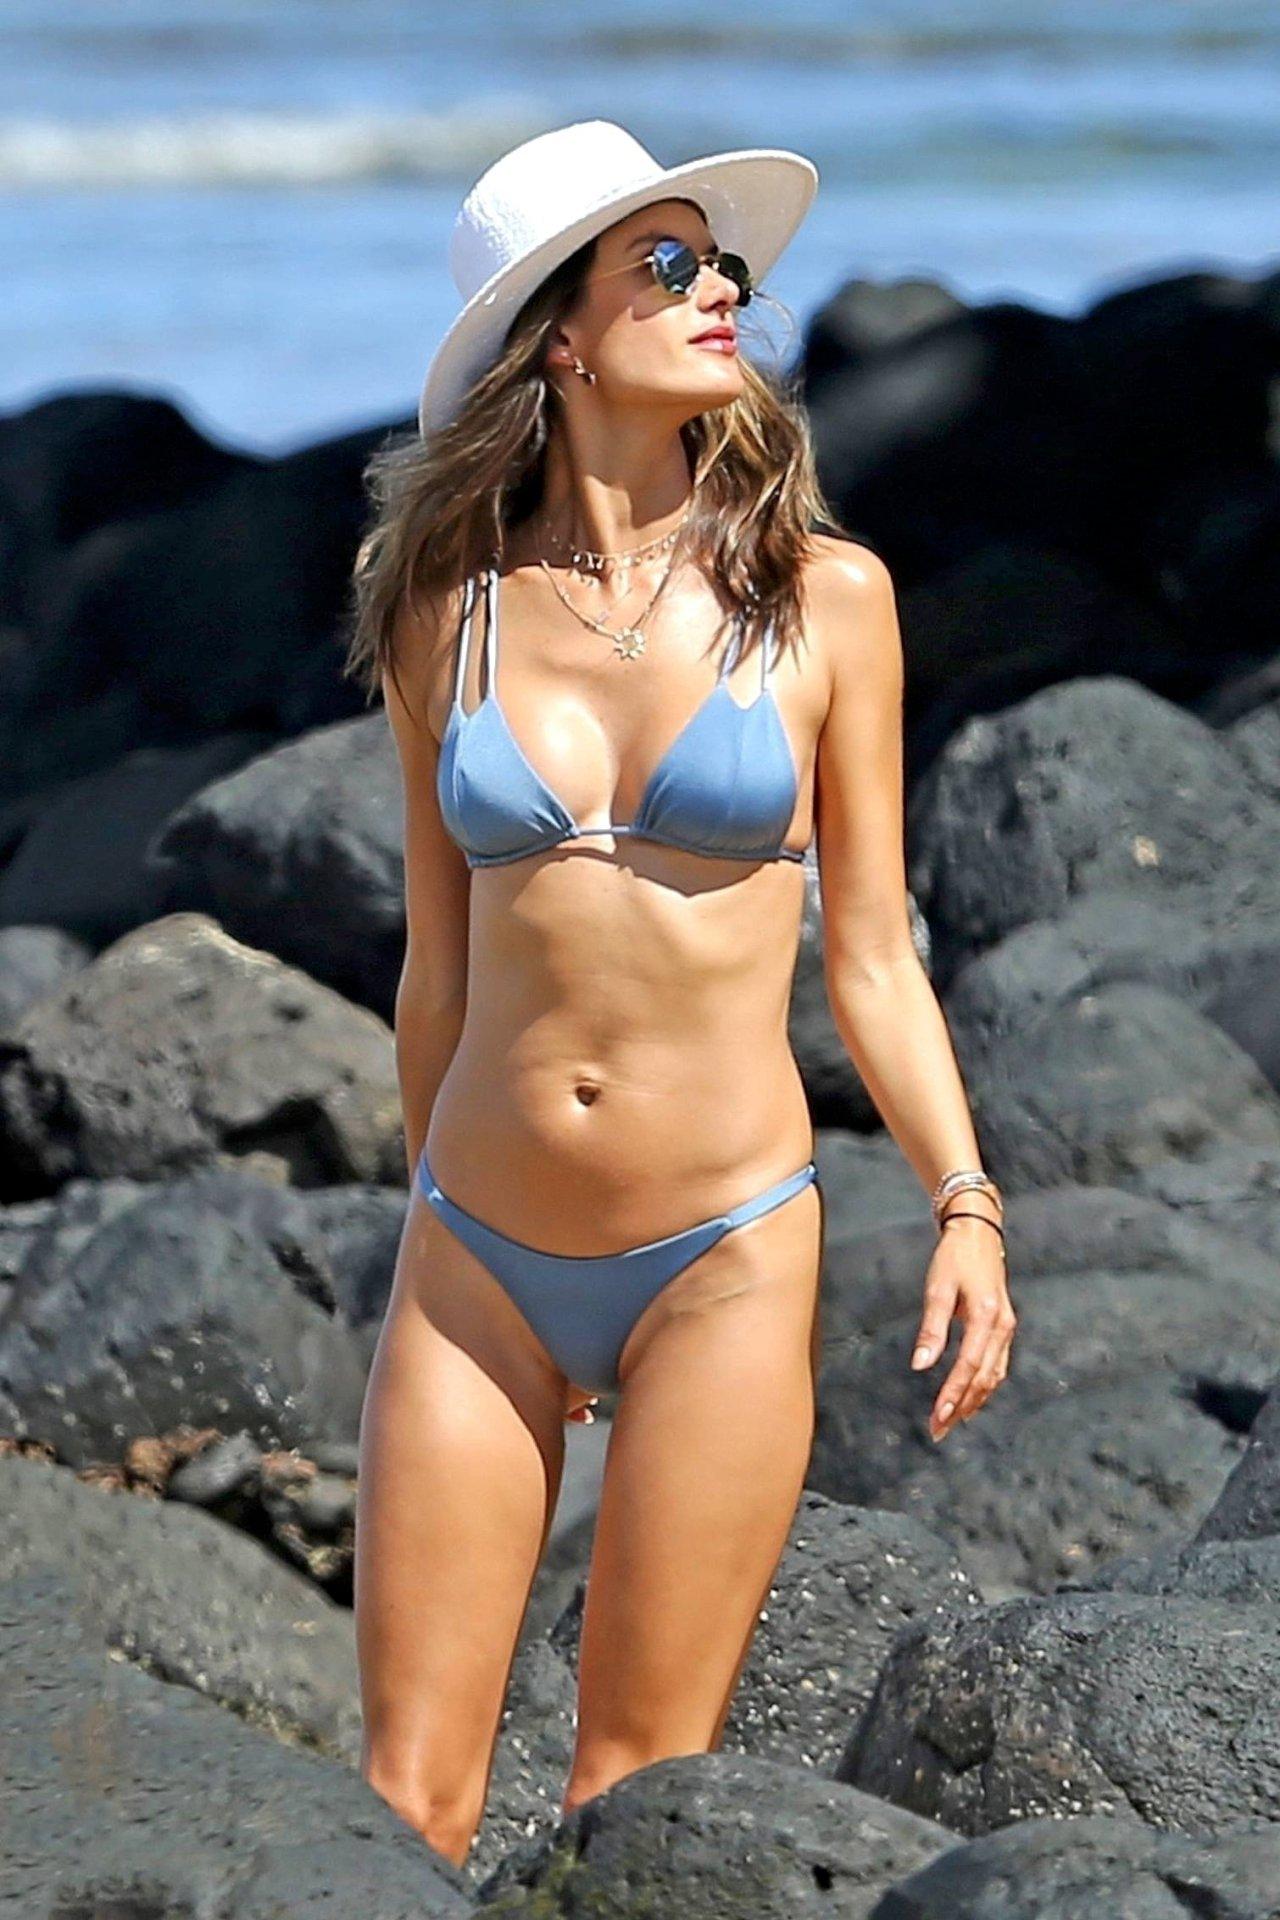 Girls pron celebrities bikinis natural sexy